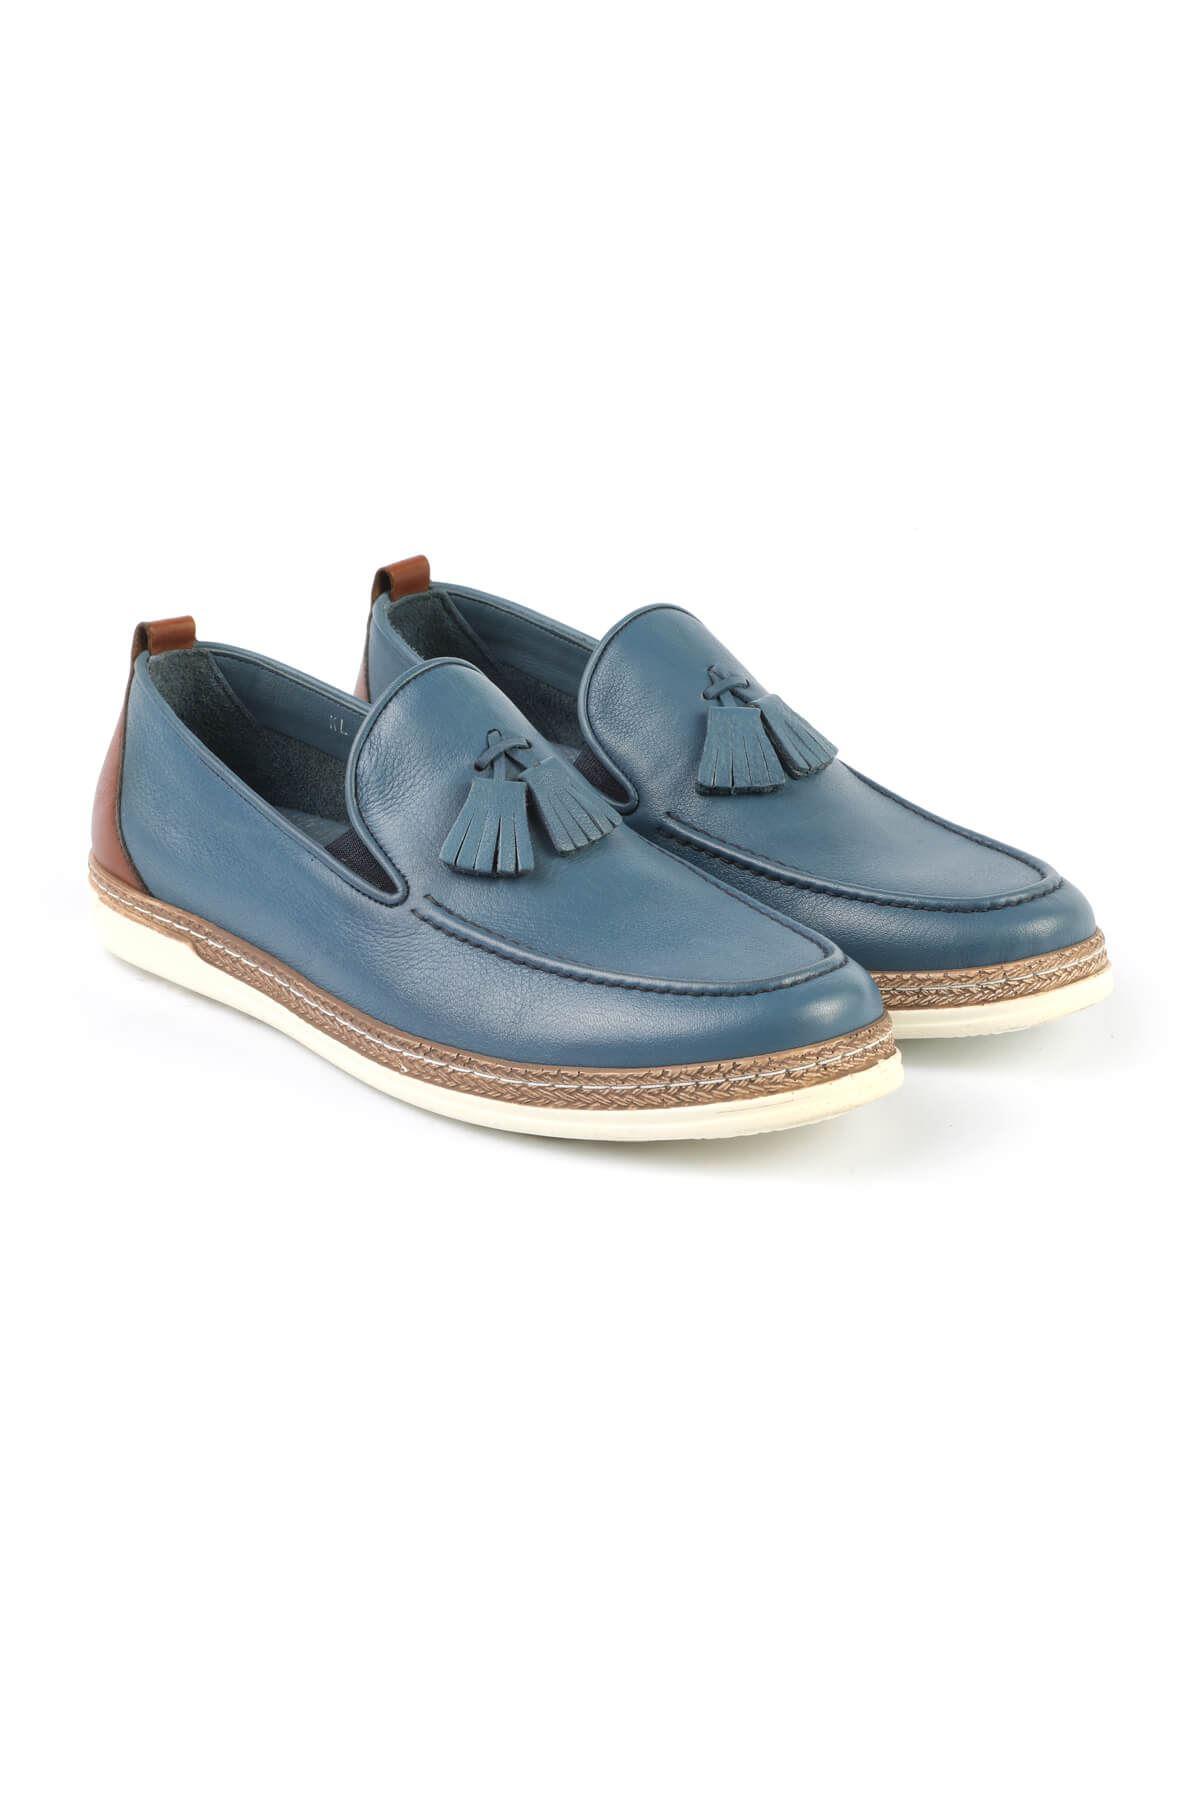 Libero C625 Blue Loafer Shoes